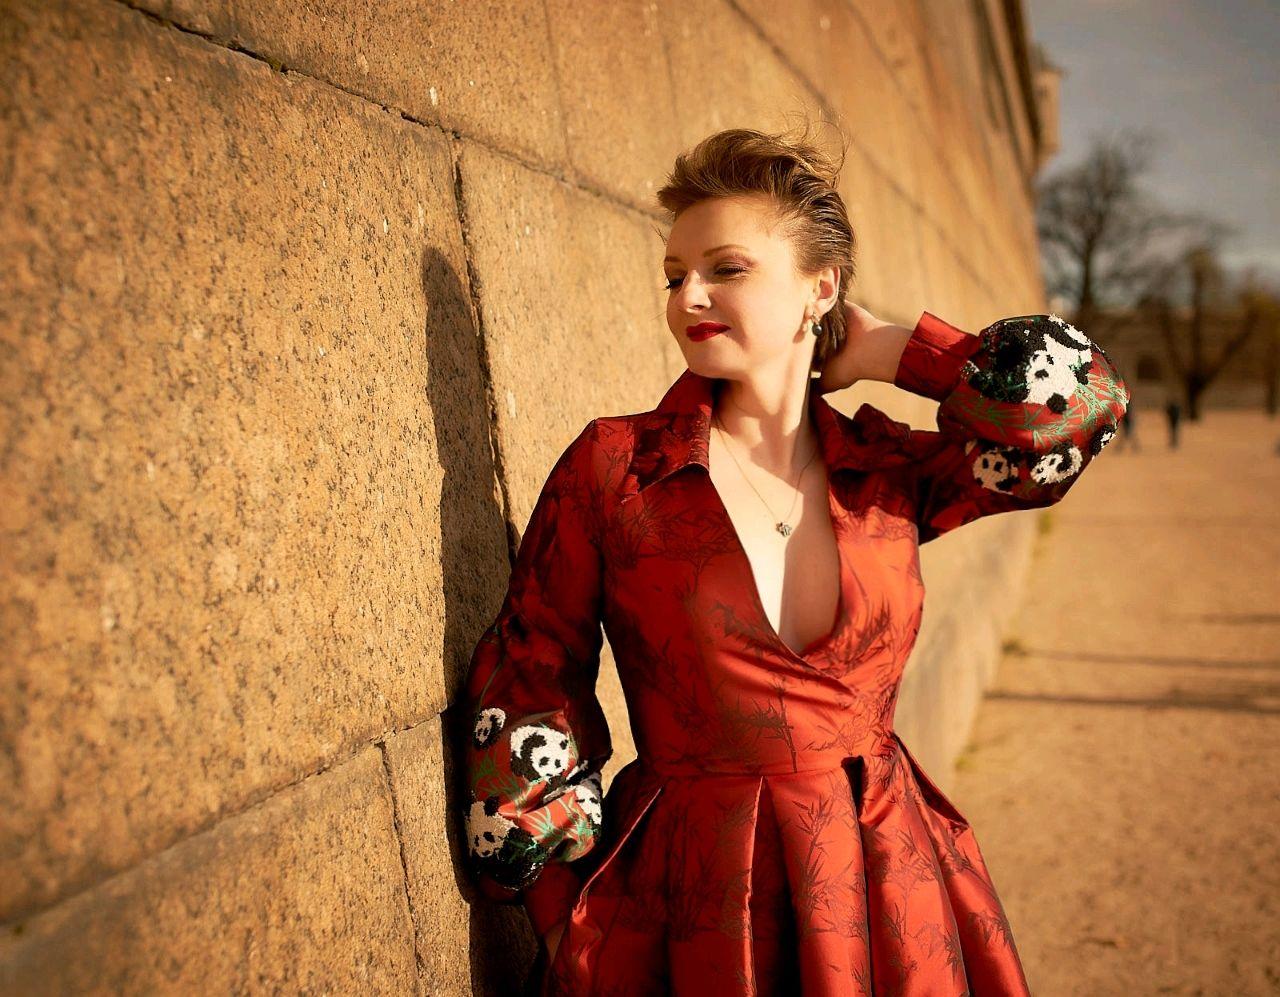 Dress made of jacquard ' Empress', Dresses, Moscow,  Фото №1